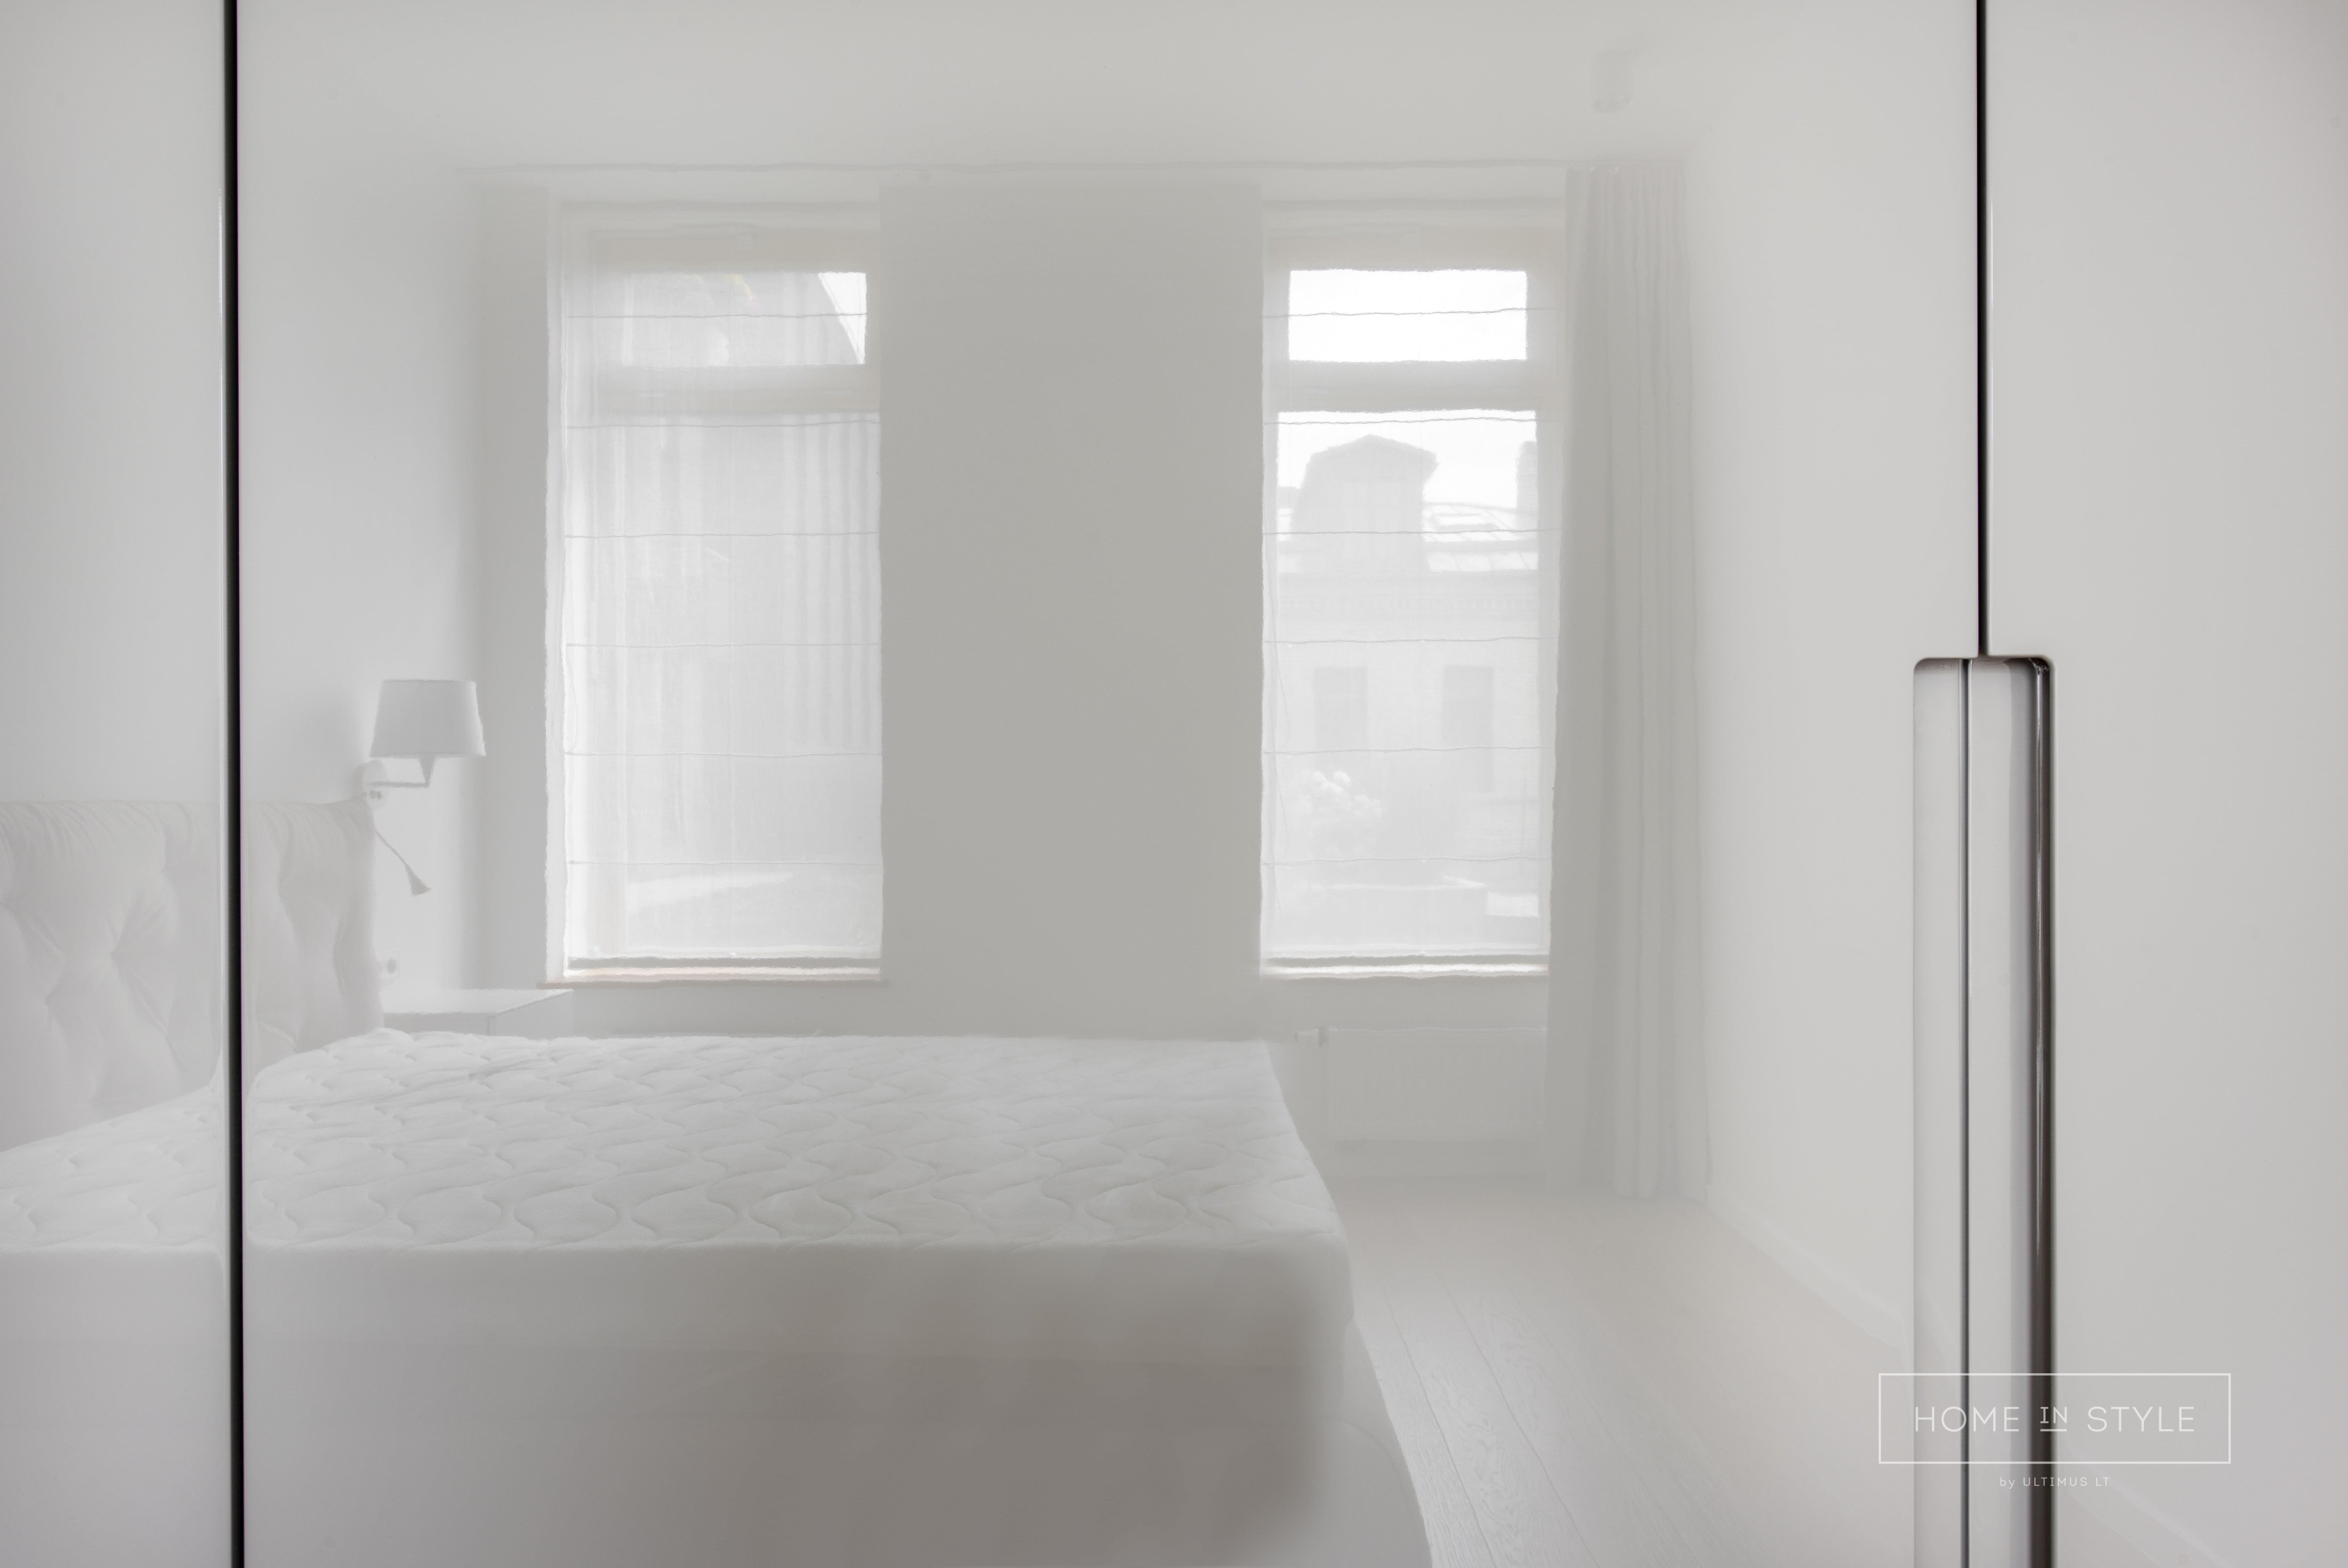 Miegamojo baldu gamyba pagal individualius uzsakymus spintos